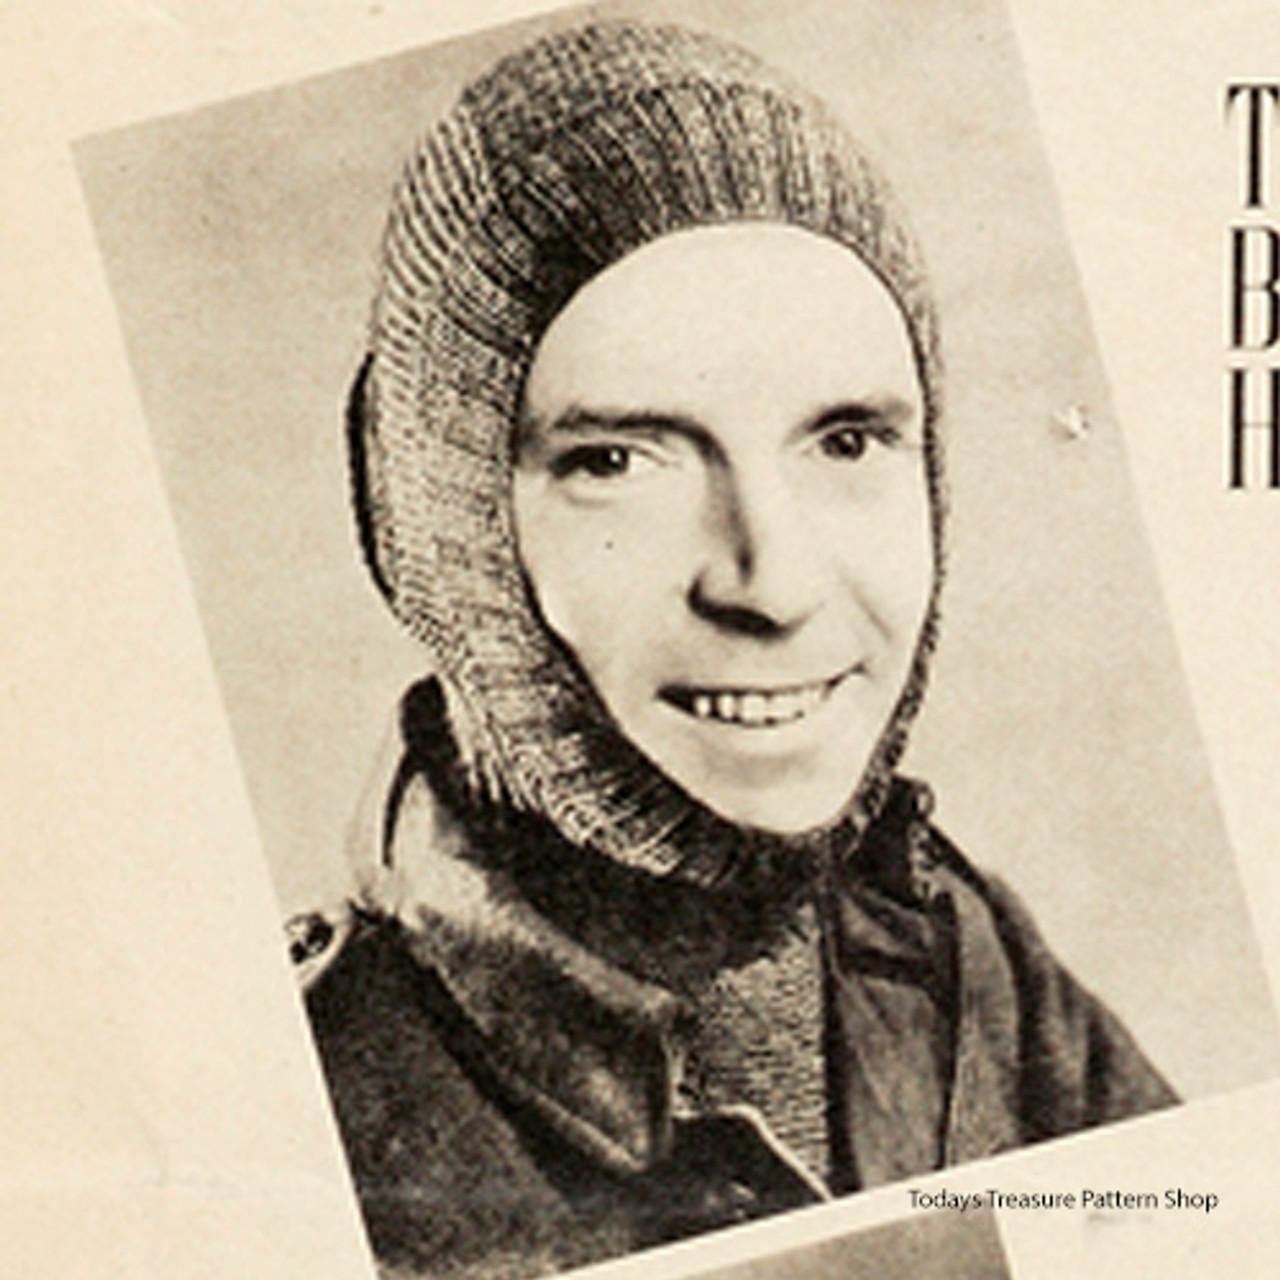 Fatigue Helmet Knitting Pattern, Vintage 1940s